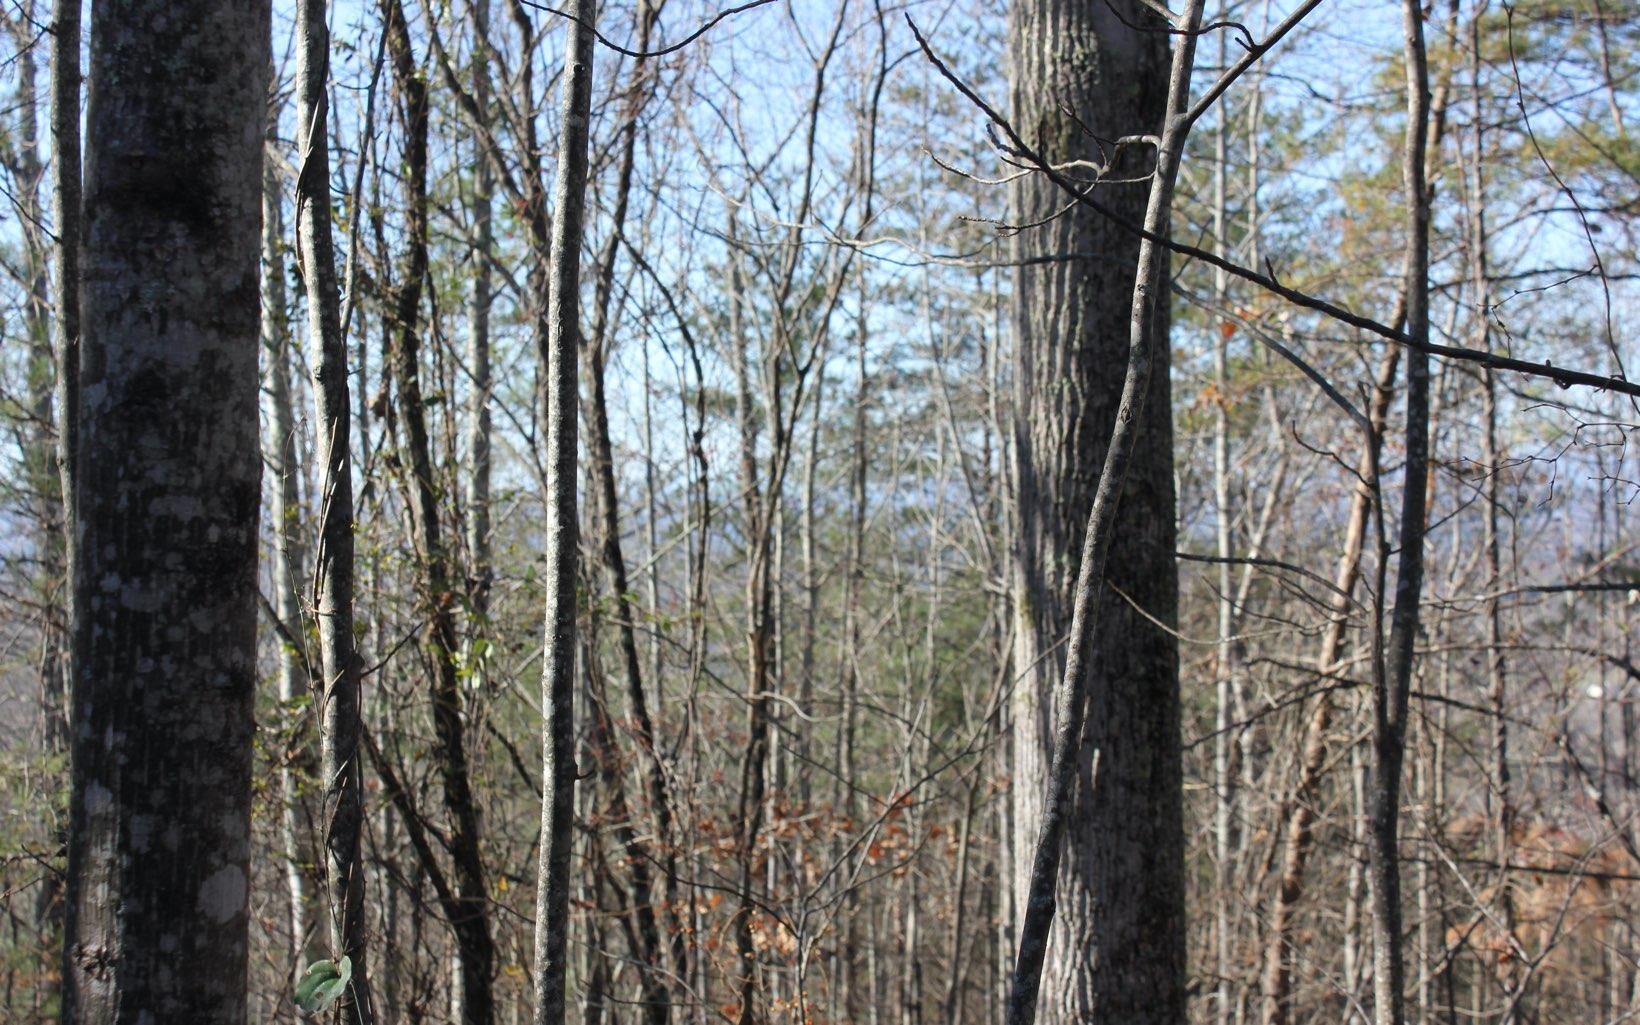 102 DEJUNCO TRAIL, Blairsville, Georgia 30512, ,Lots And Land,For Sale,102 DEJUNCO TRAIL,302831